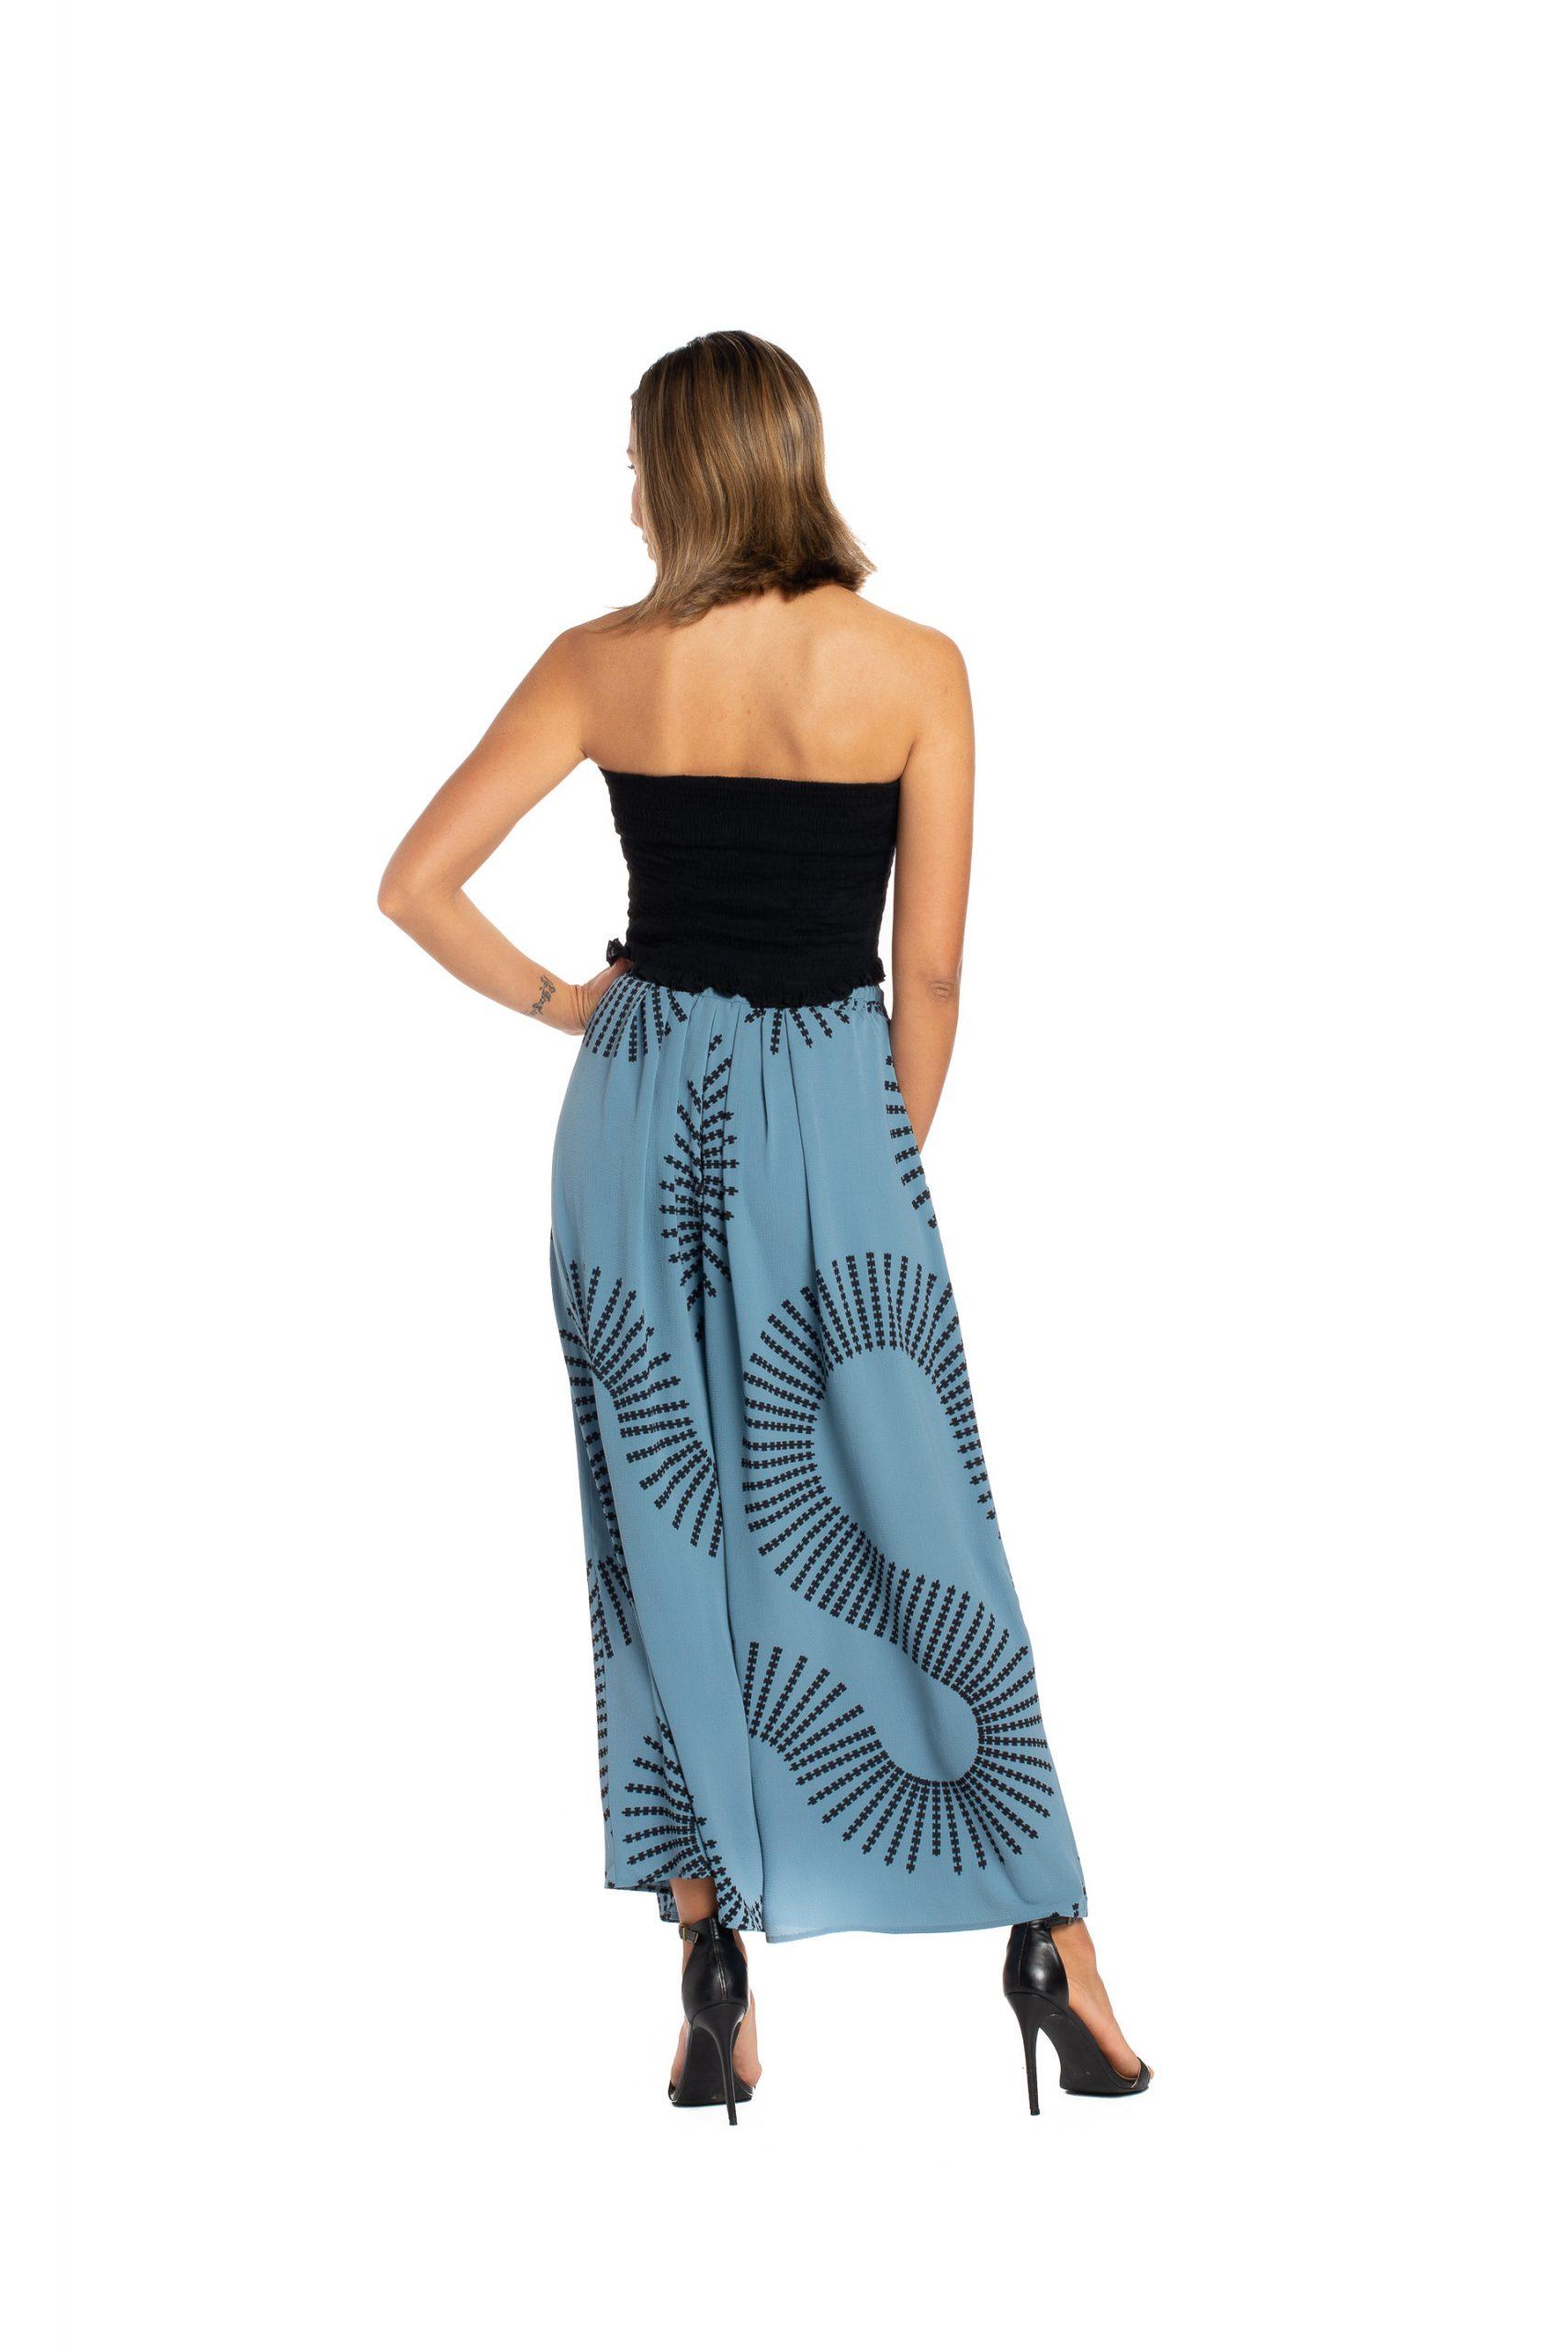 Model wearing Kapakai Flow Pant in Pro. Blue - Back View